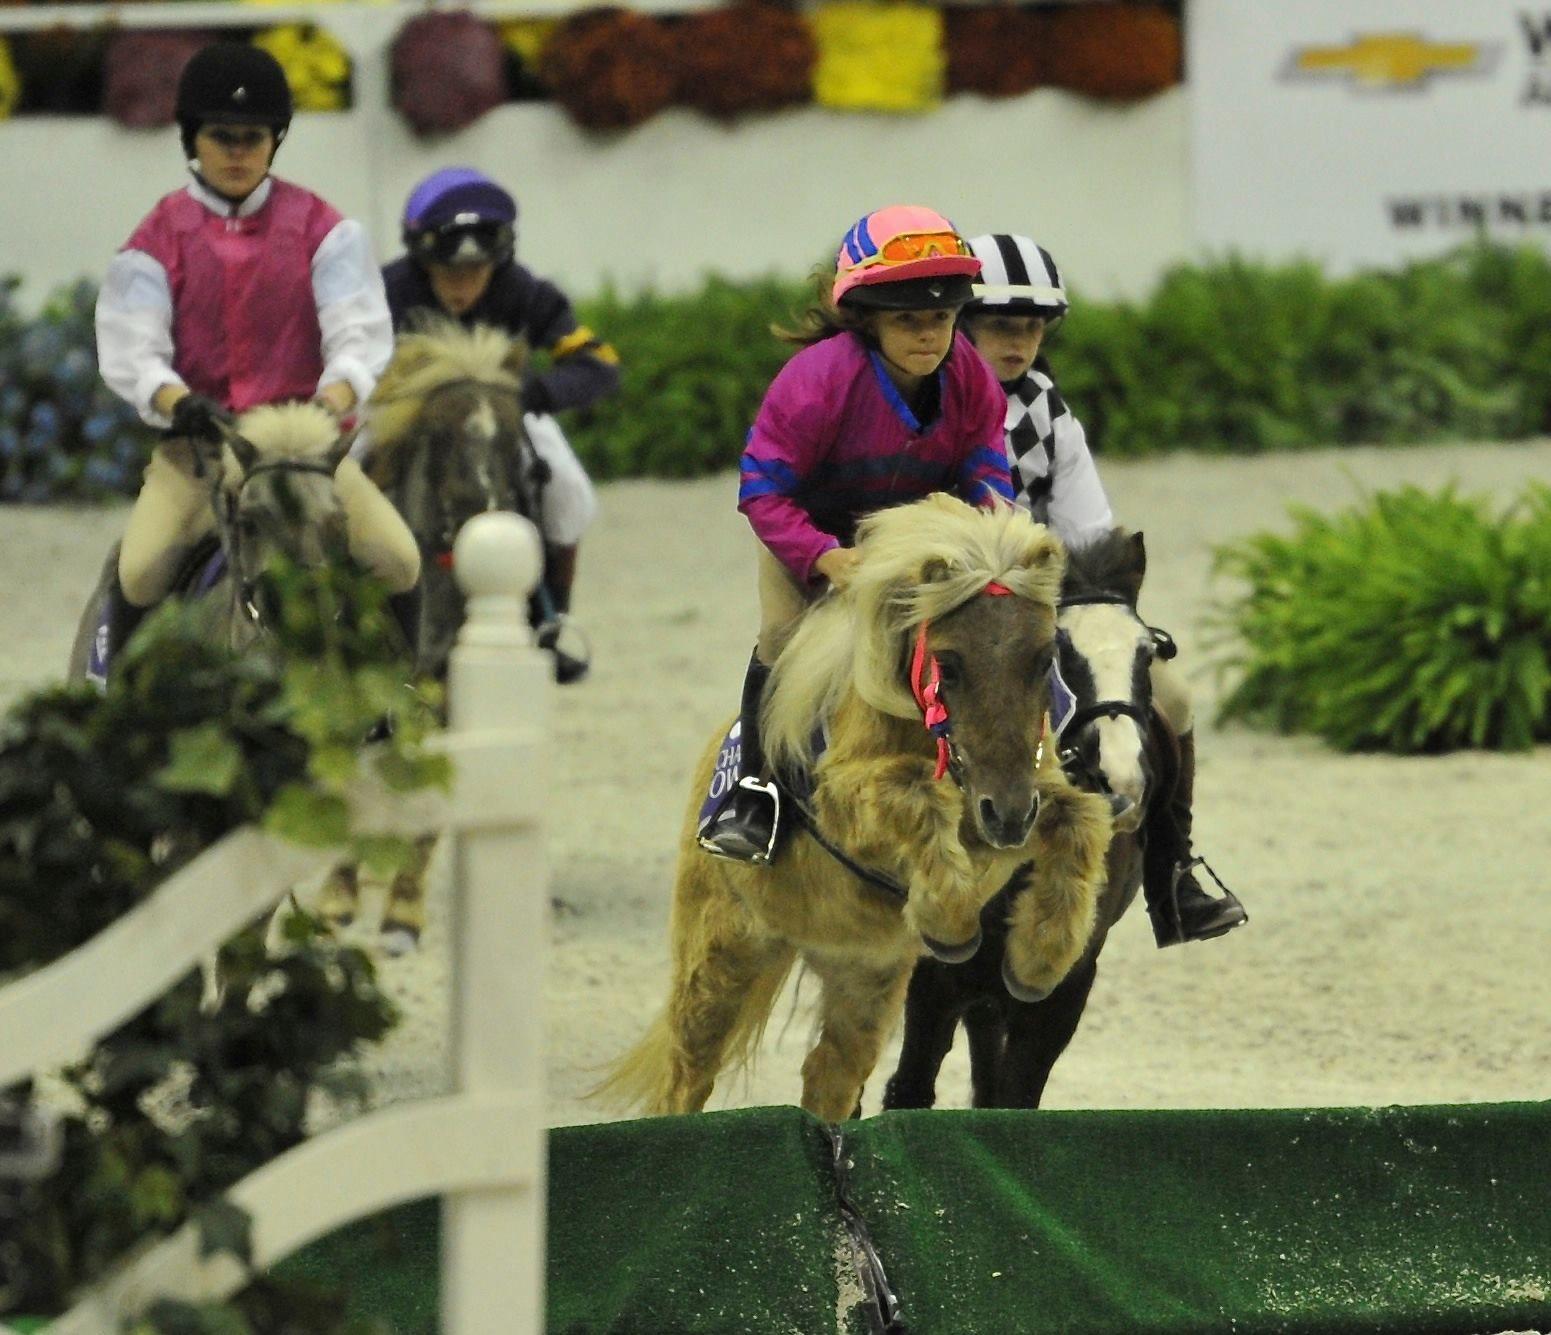 Shetland Pony race at the Washington international Horse Show